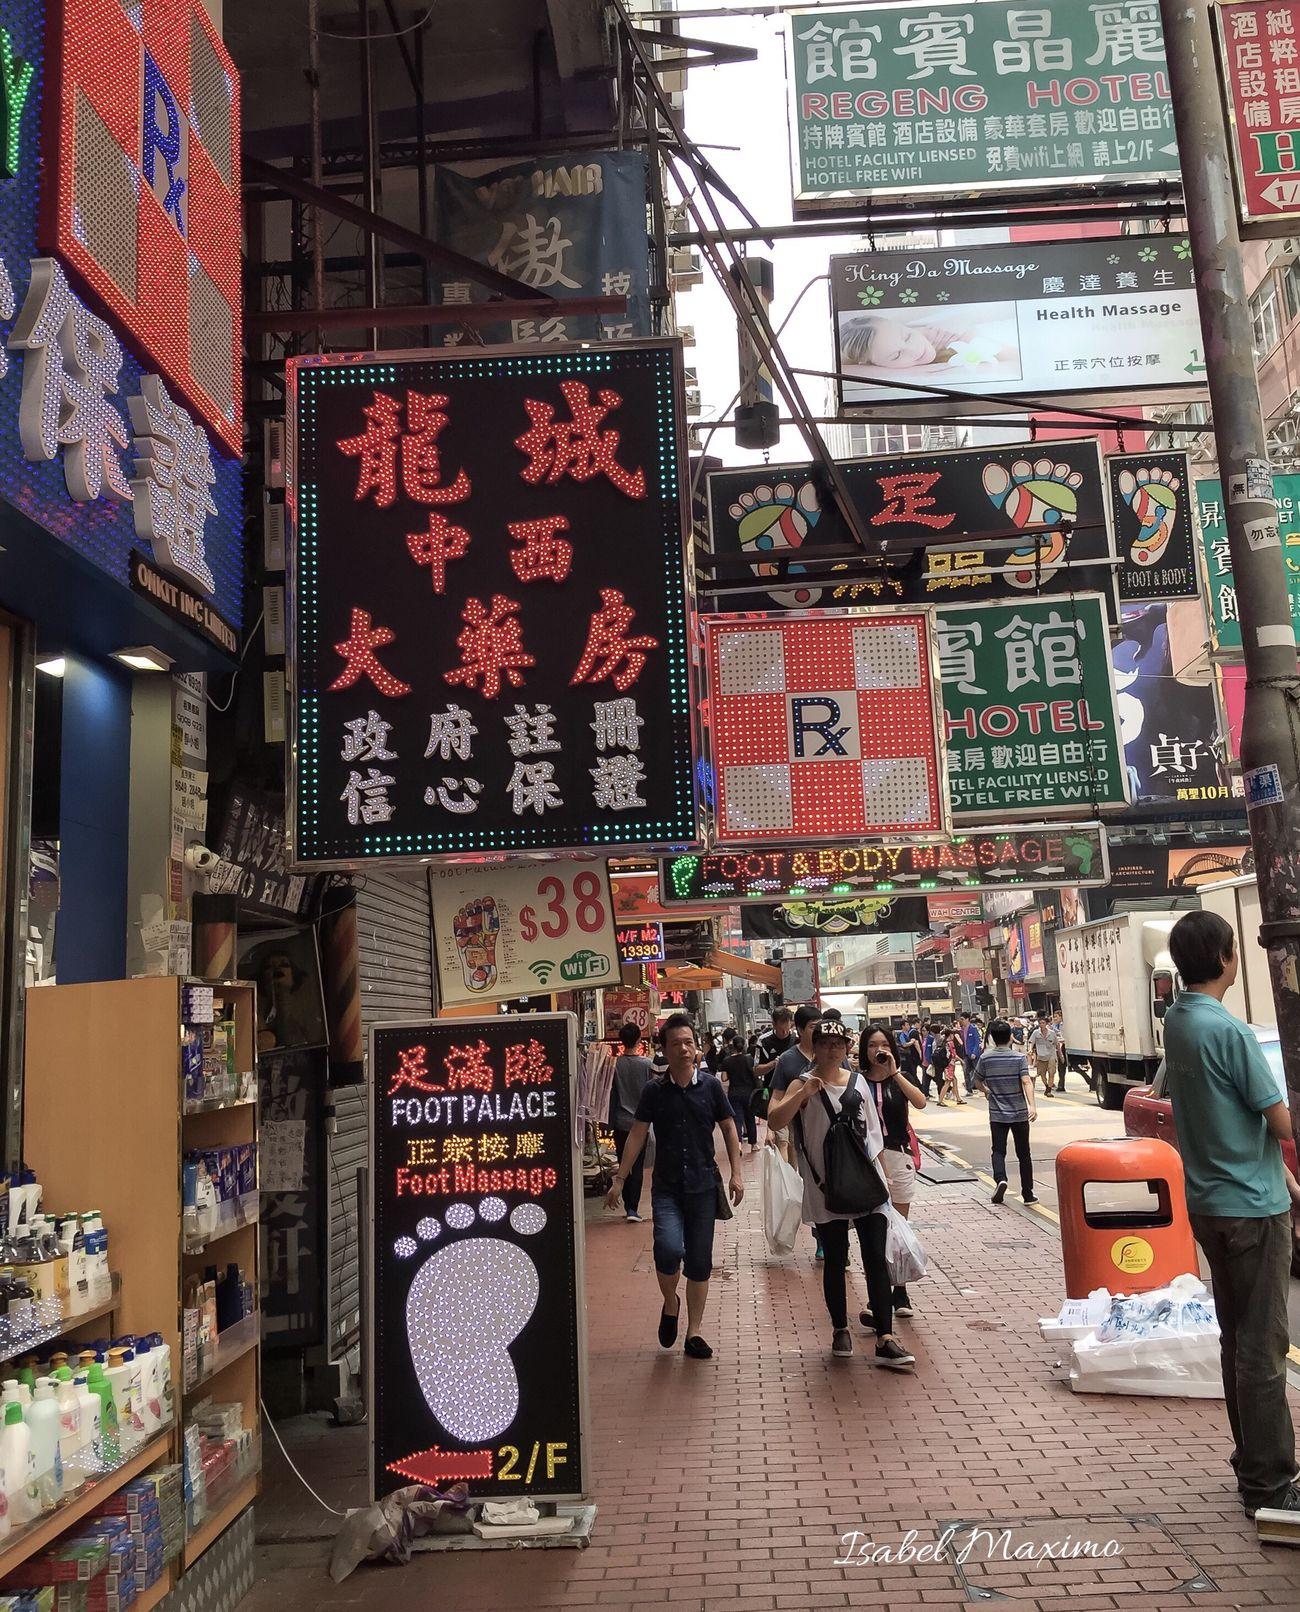 @izzymaxie Street of Kowloon, HongKong KowloonCity Kowloon, HK Street Photography Street Life Streetphoto_color Streetlife Streetview Outdoor Photography Outdoor Pictures Outdoor Life Hongkong Photos Hongkongstreet Hongkonglife Hongkongeyeem Eye4photography  EyeEm Gallery